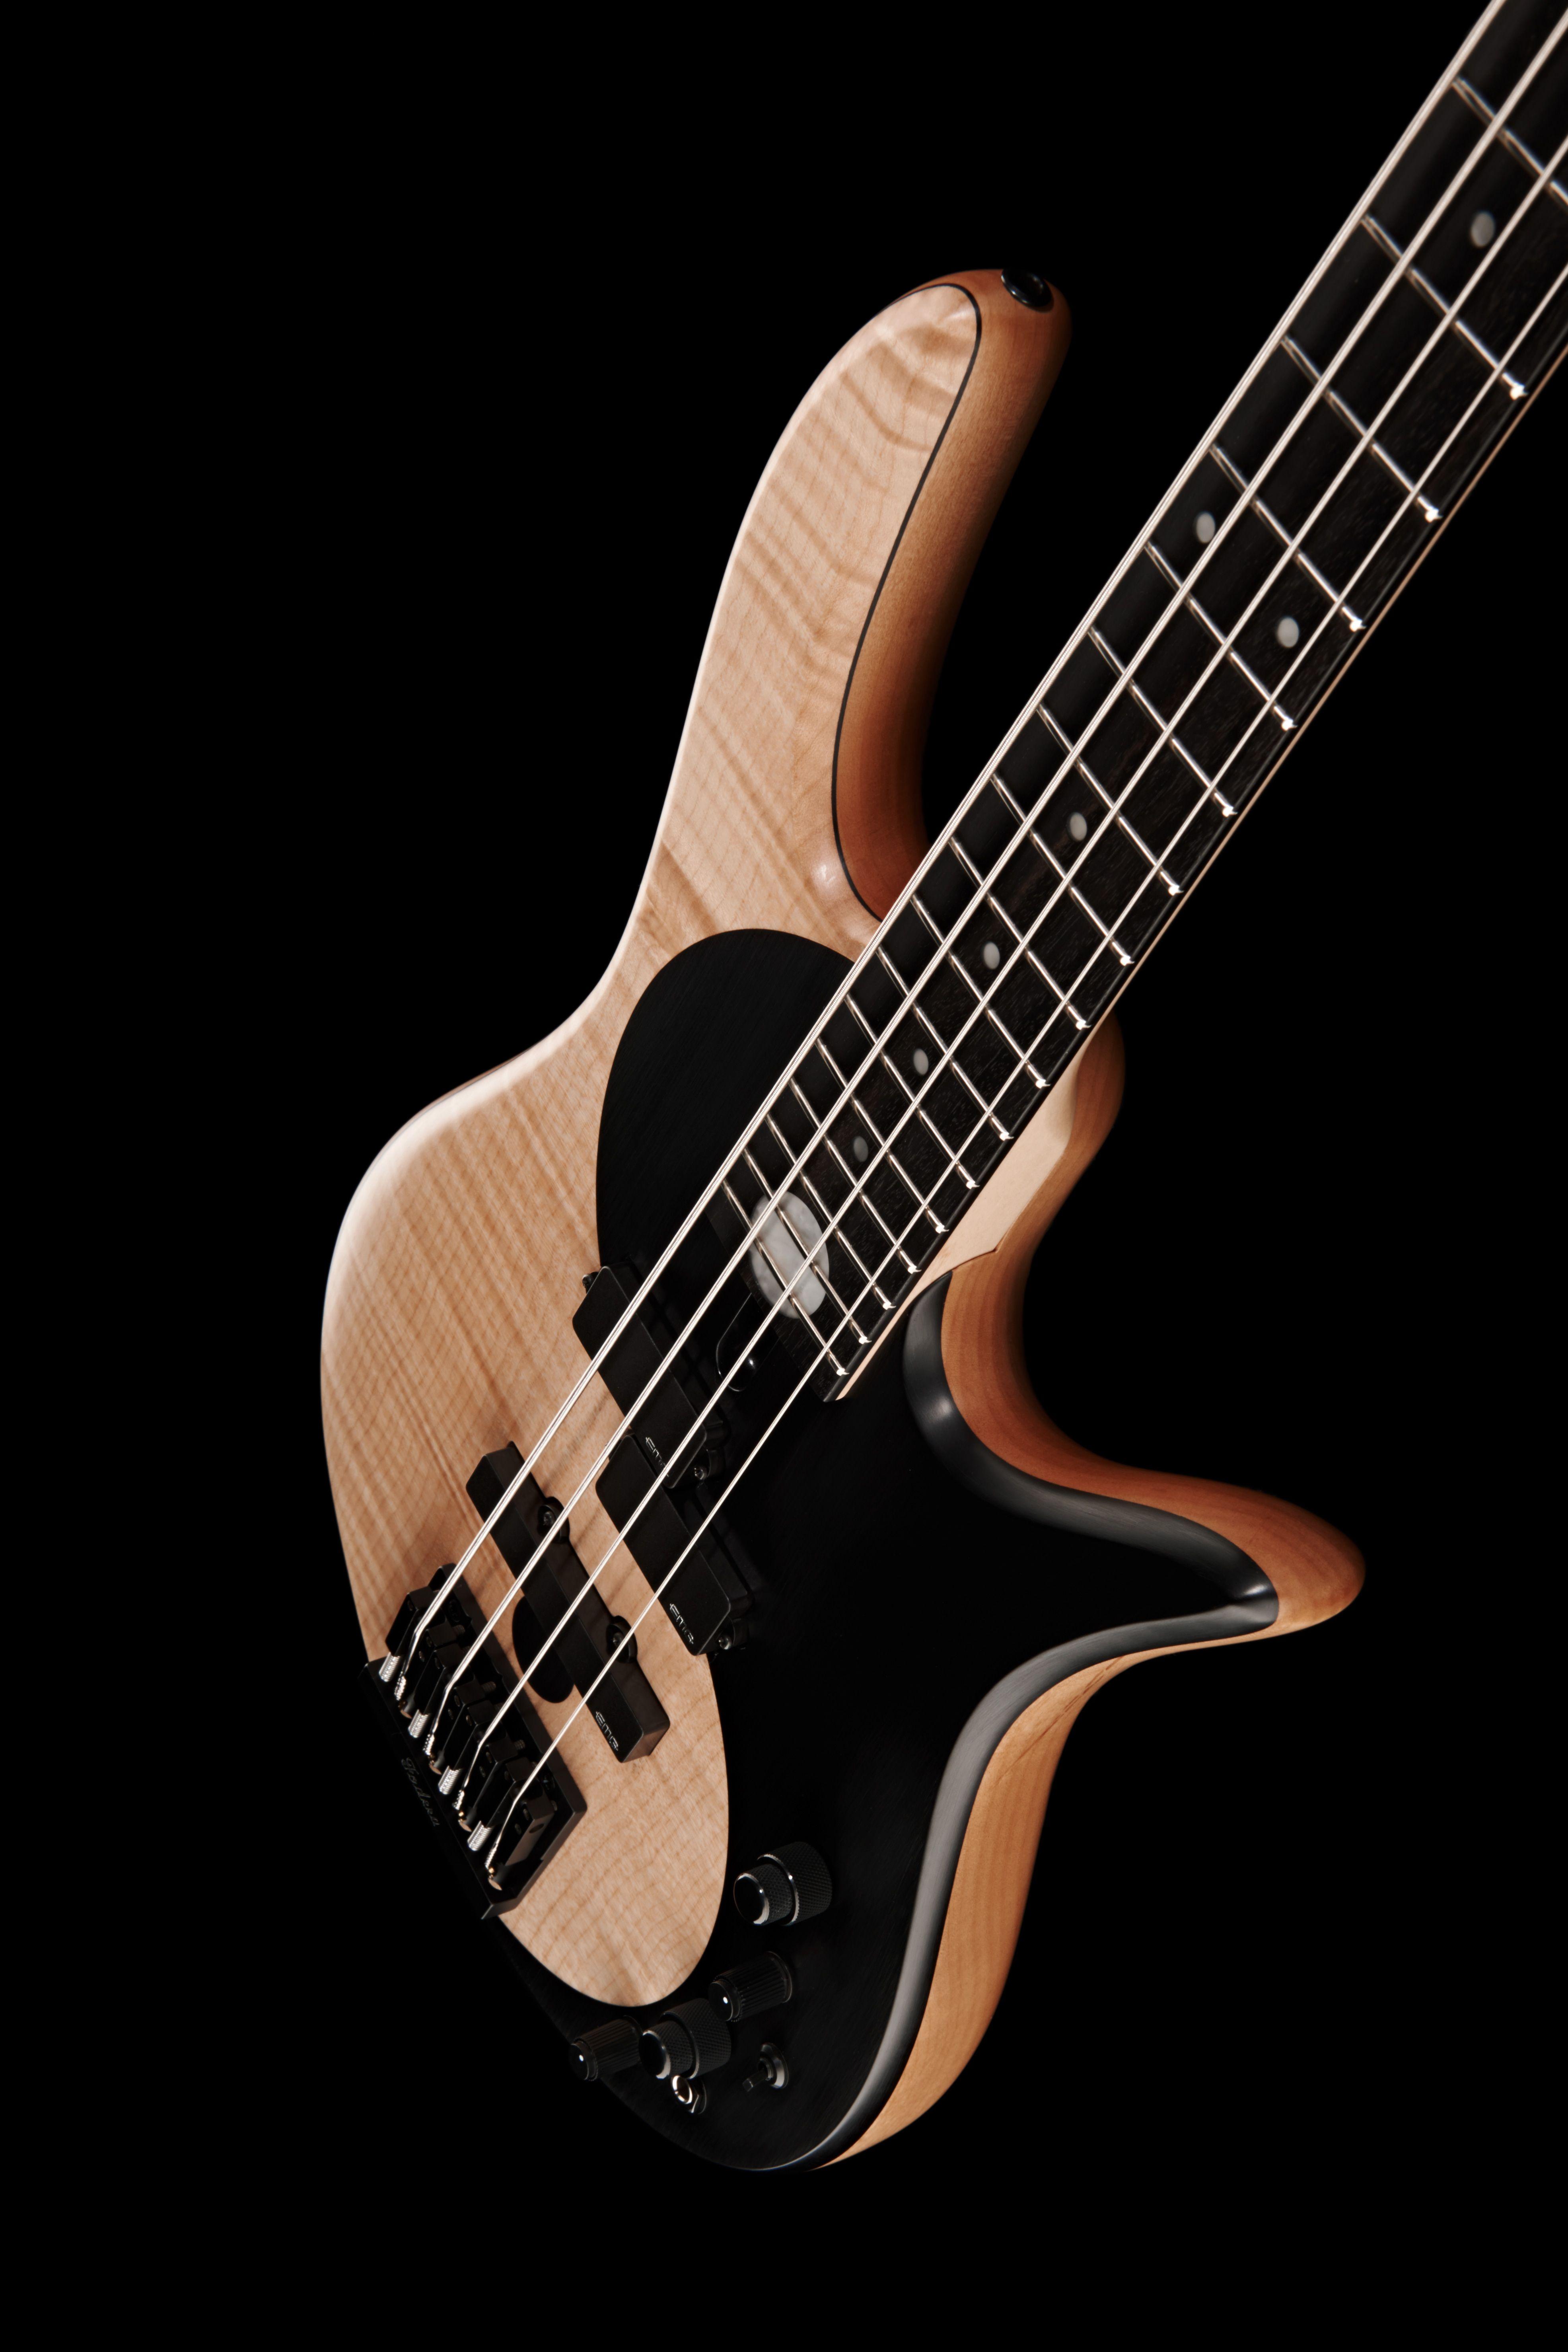 fodera yin yang standard 4 yys159 fordera bass thomann bass guitars bass yin yang guitar. Black Bedroom Furniture Sets. Home Design Ideas